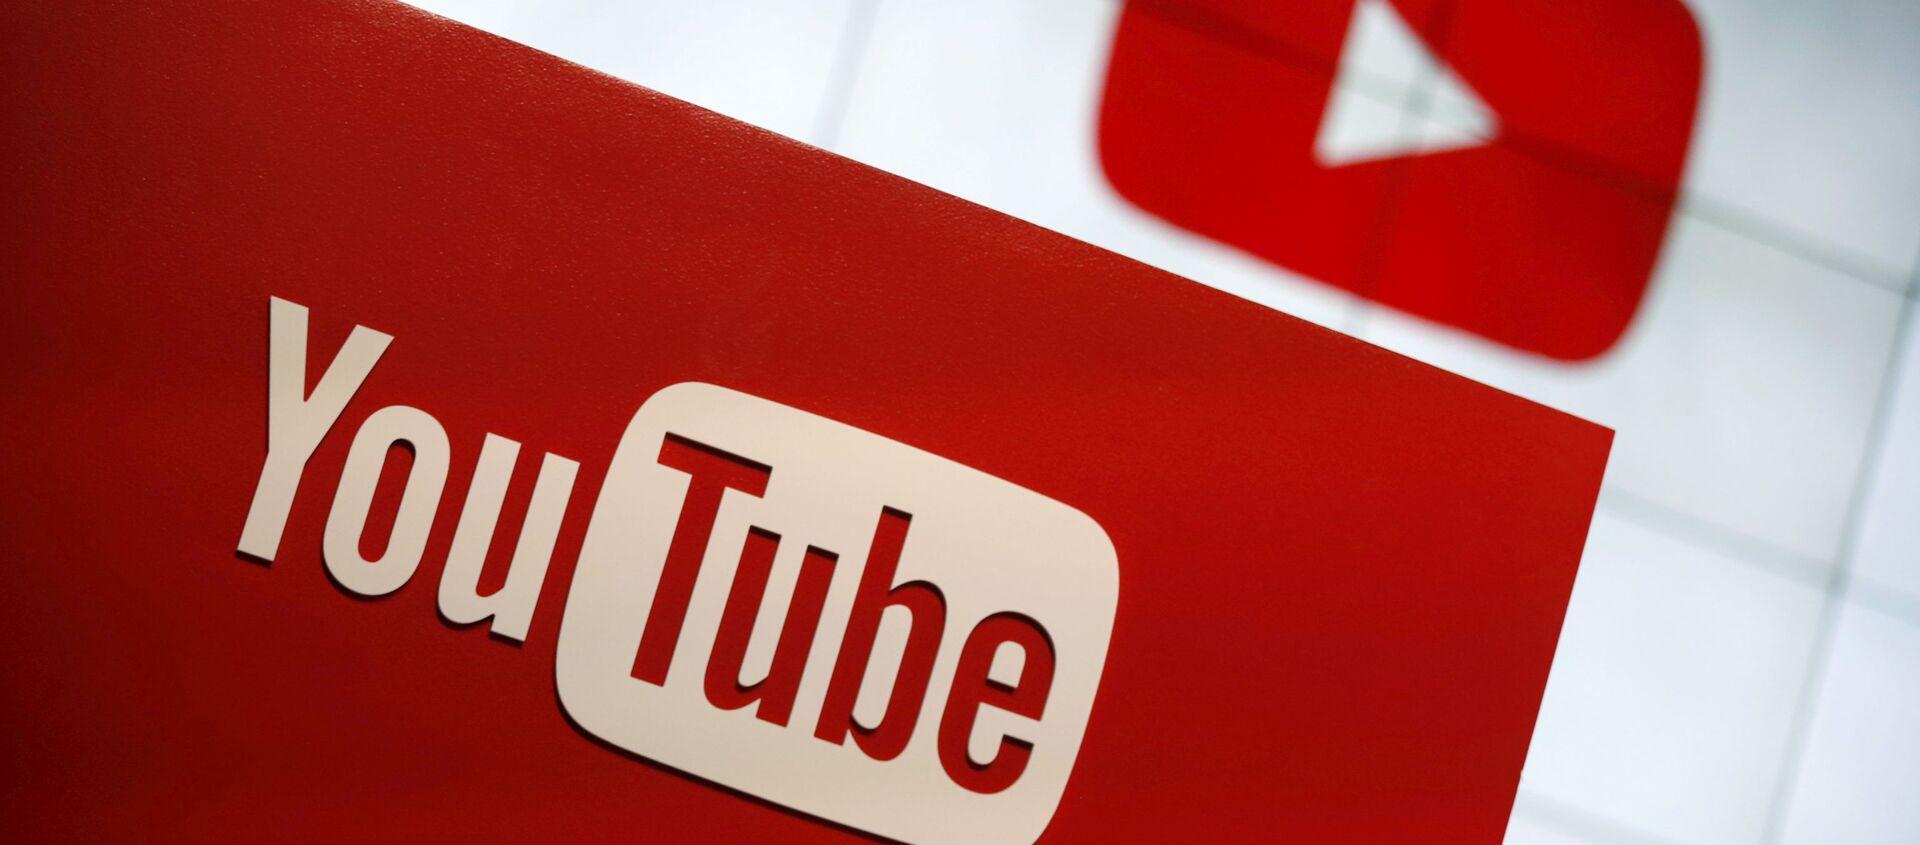 YouTube logo at the YouTube Space LA in Playa Del Rey, Los Angeles, California, United States October 21, 2015. - Sputnik International, 1920